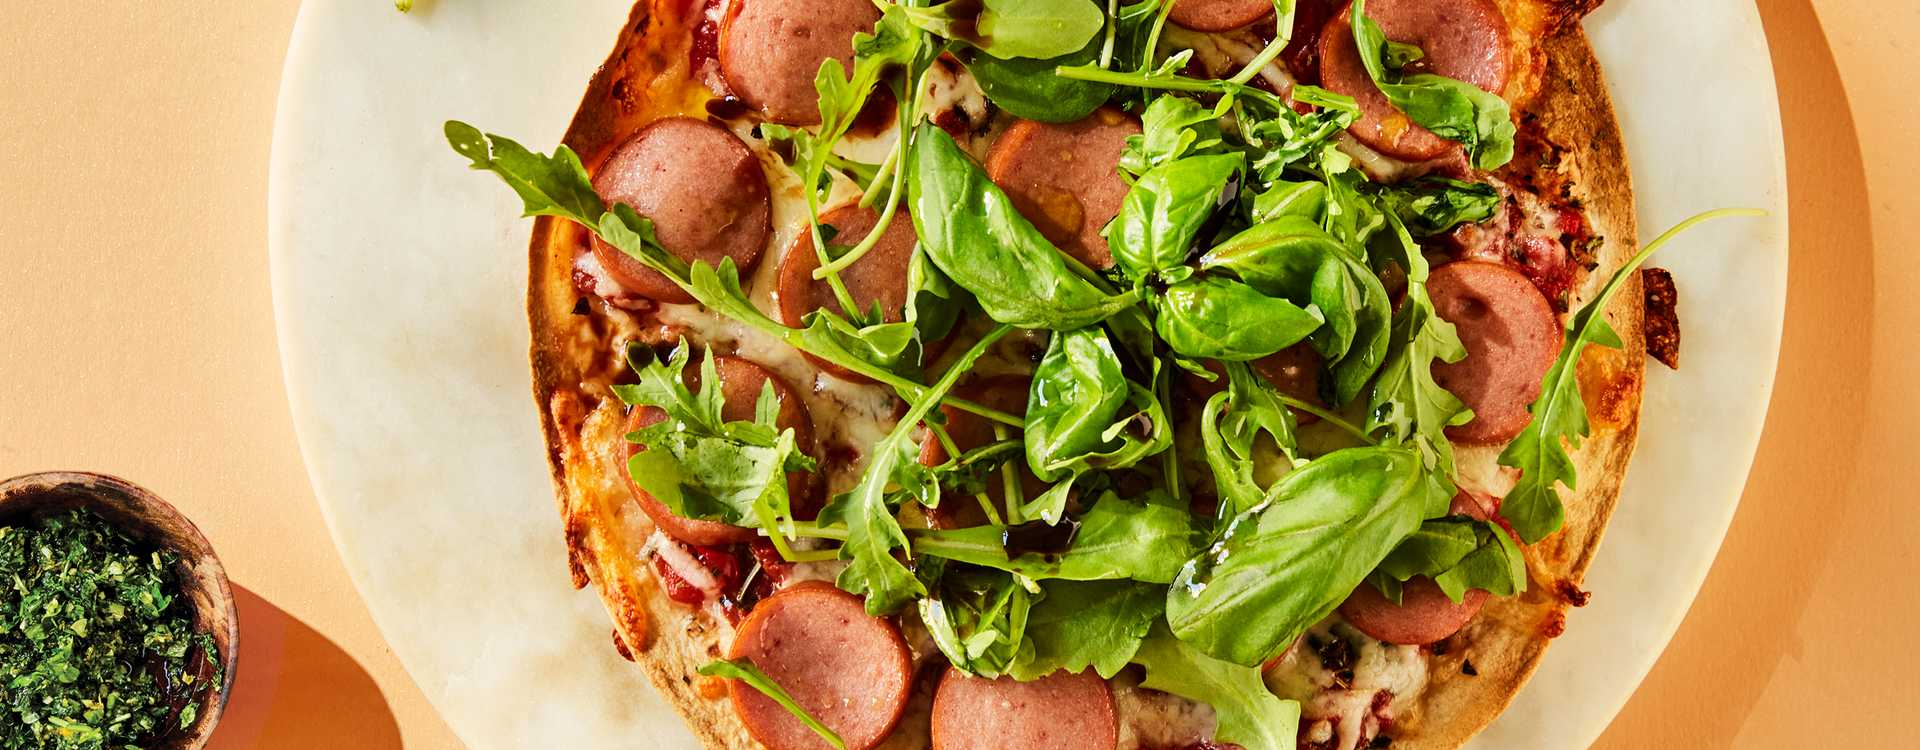 Tortillapizza med kjøttpølser